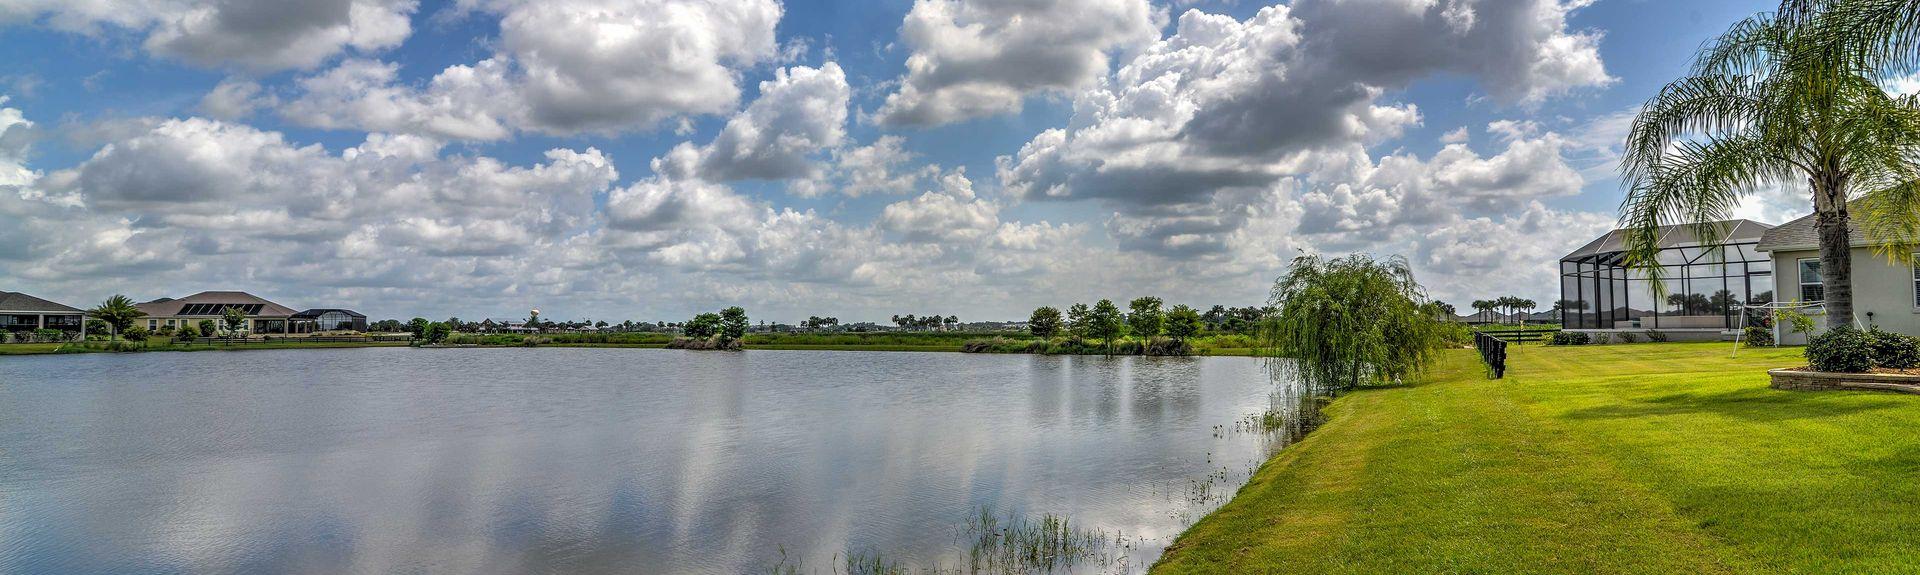 Bushnell, Florida, United States of America